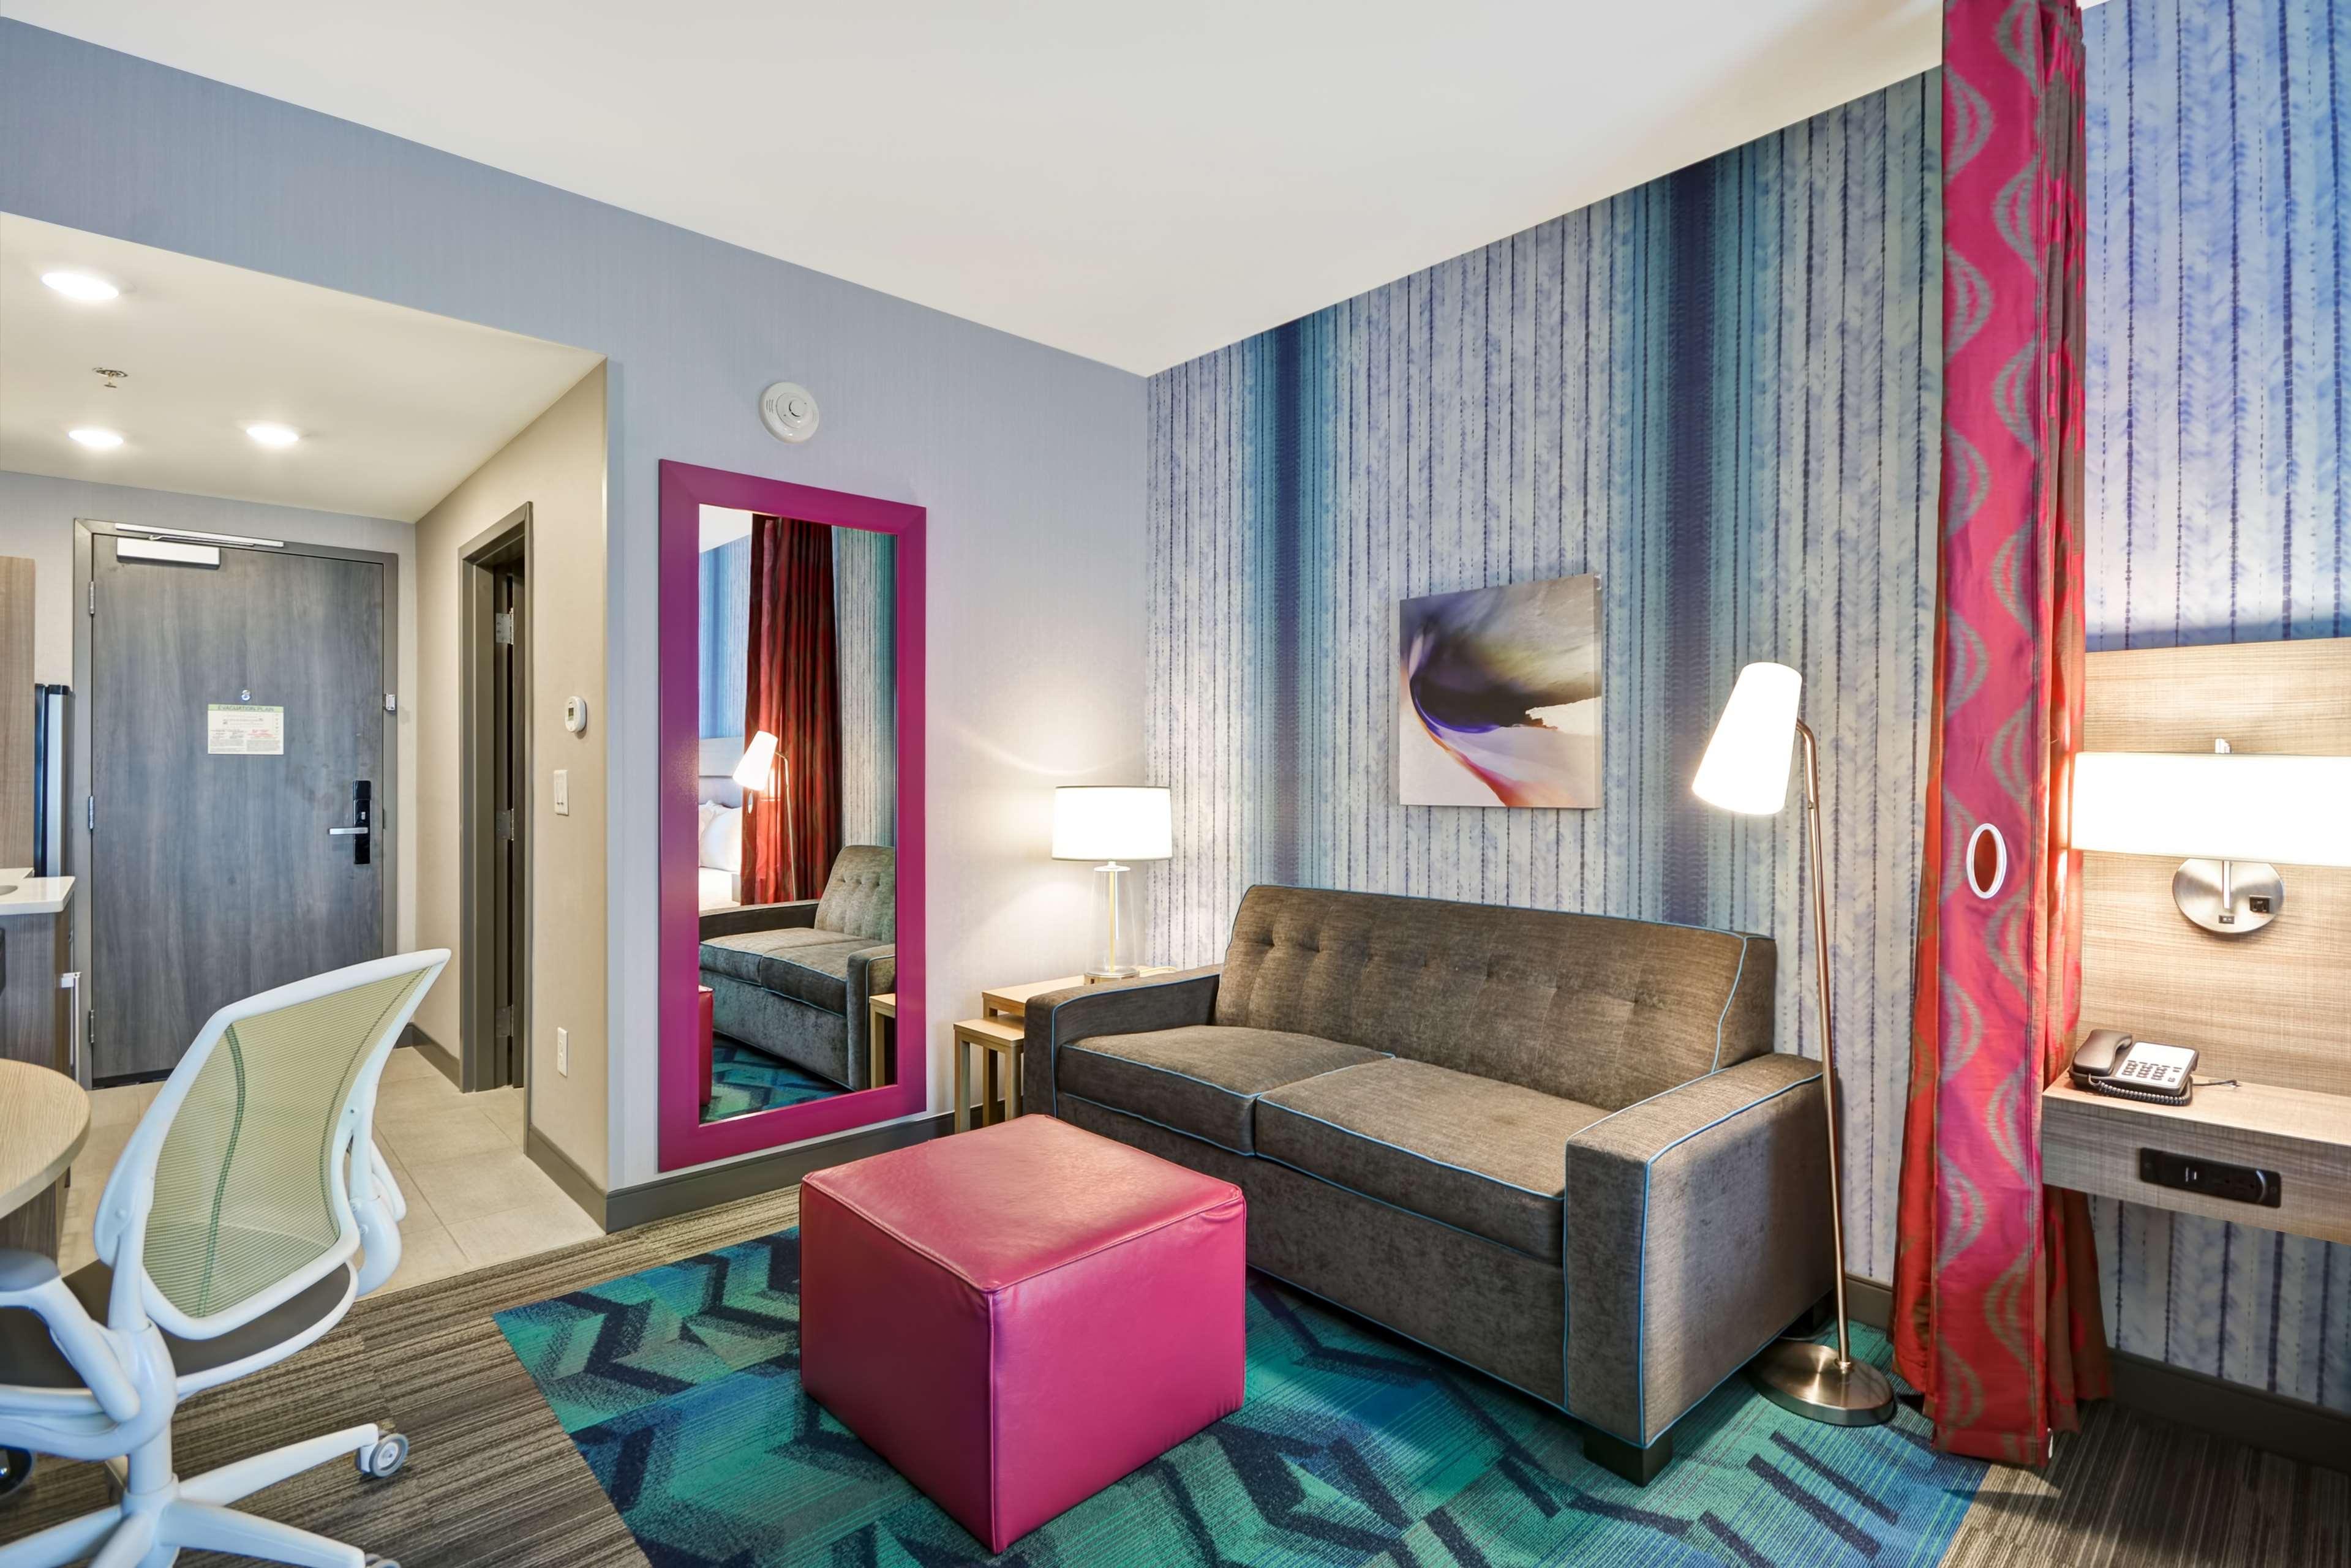 Home2 Suites by Hilton Atlanta West Lithia Springs image 31